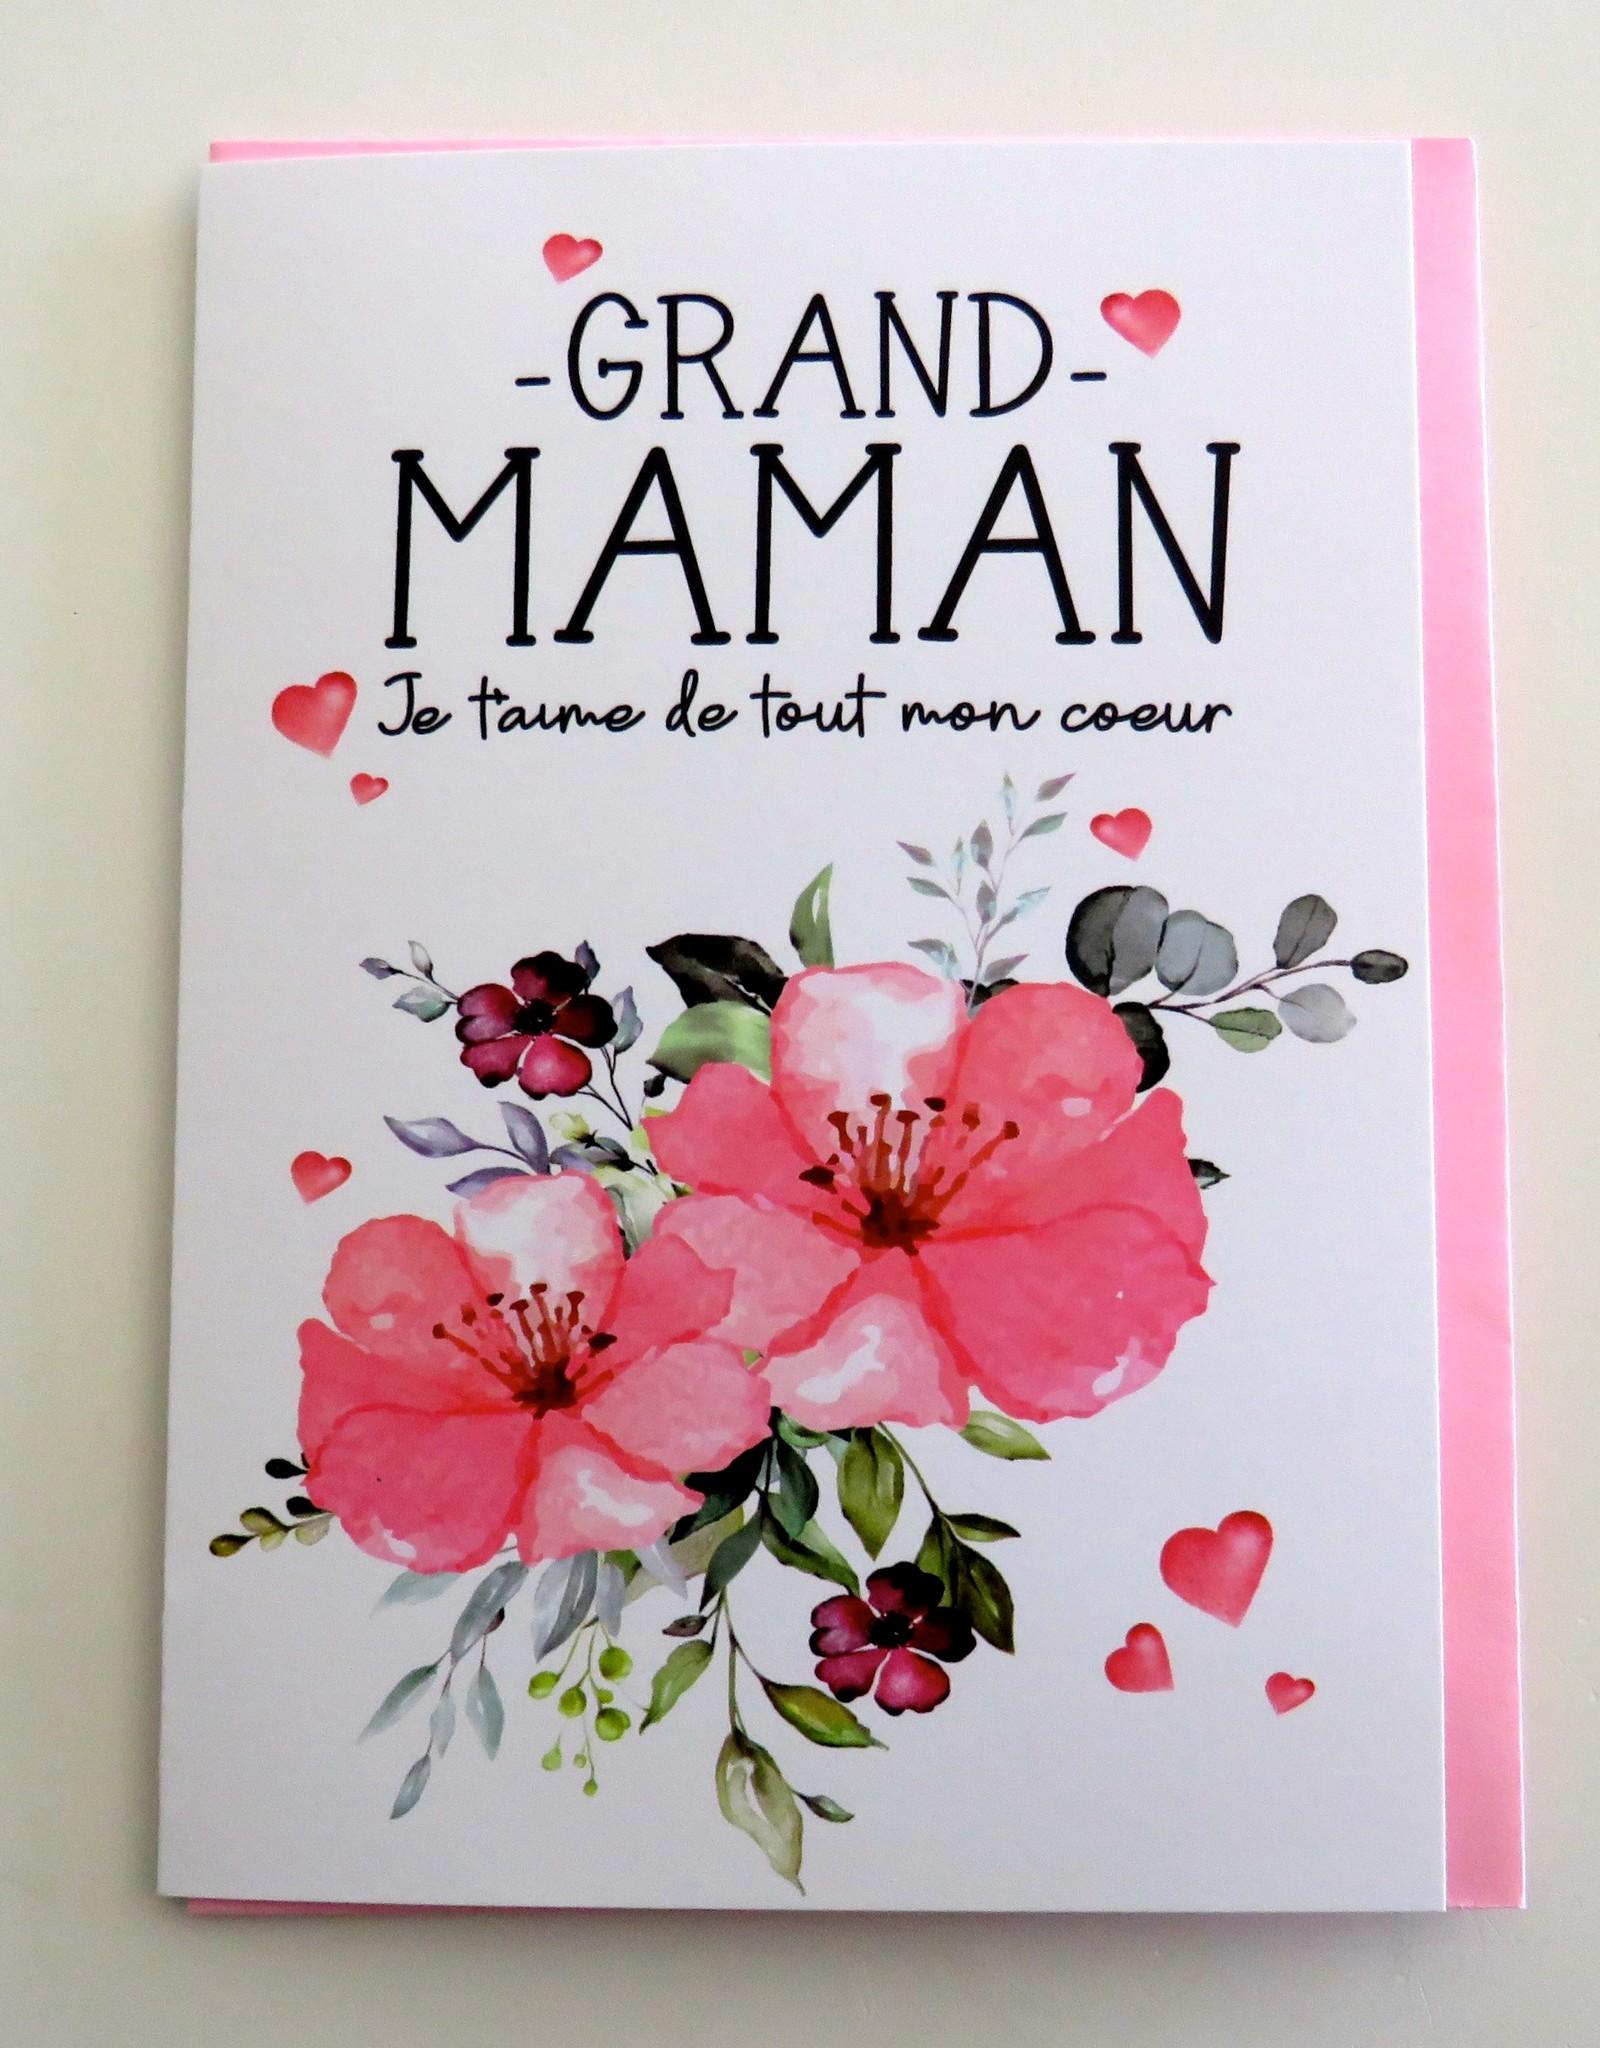 Carte de souhaits Grand-maman